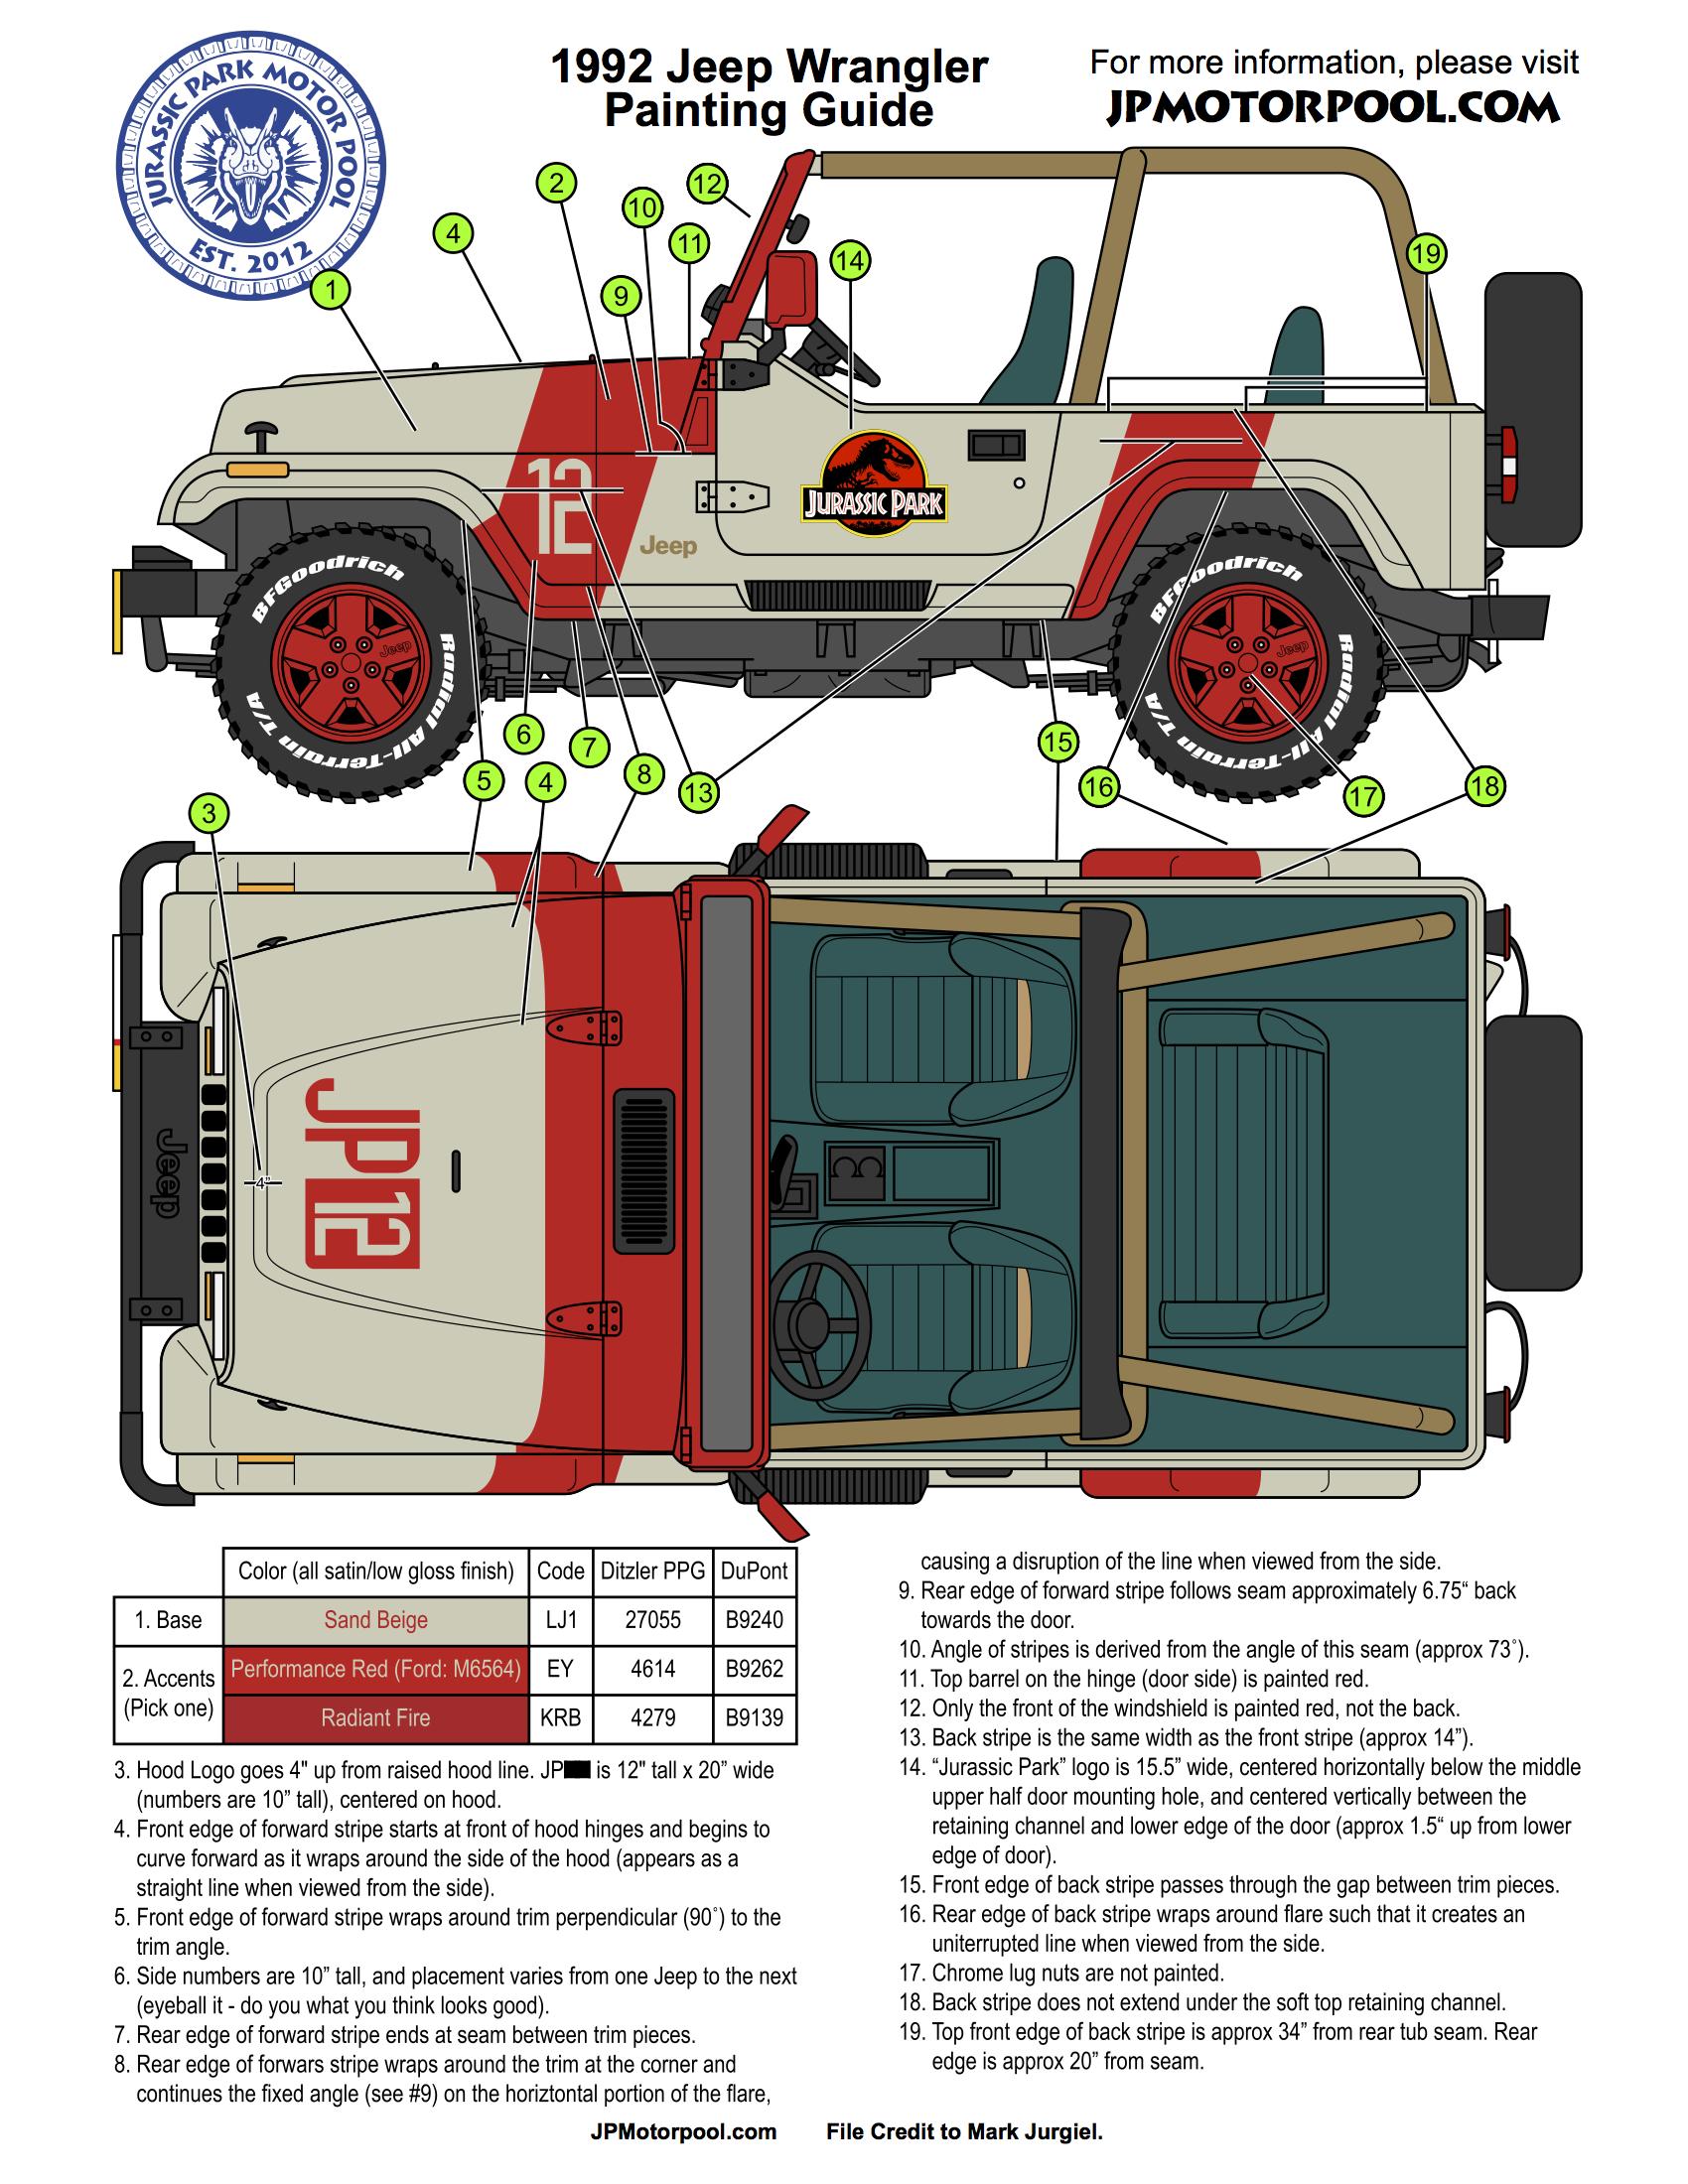 Click To Hide Jurassic Park Car Jurassic Park Jeep Jurassic Park